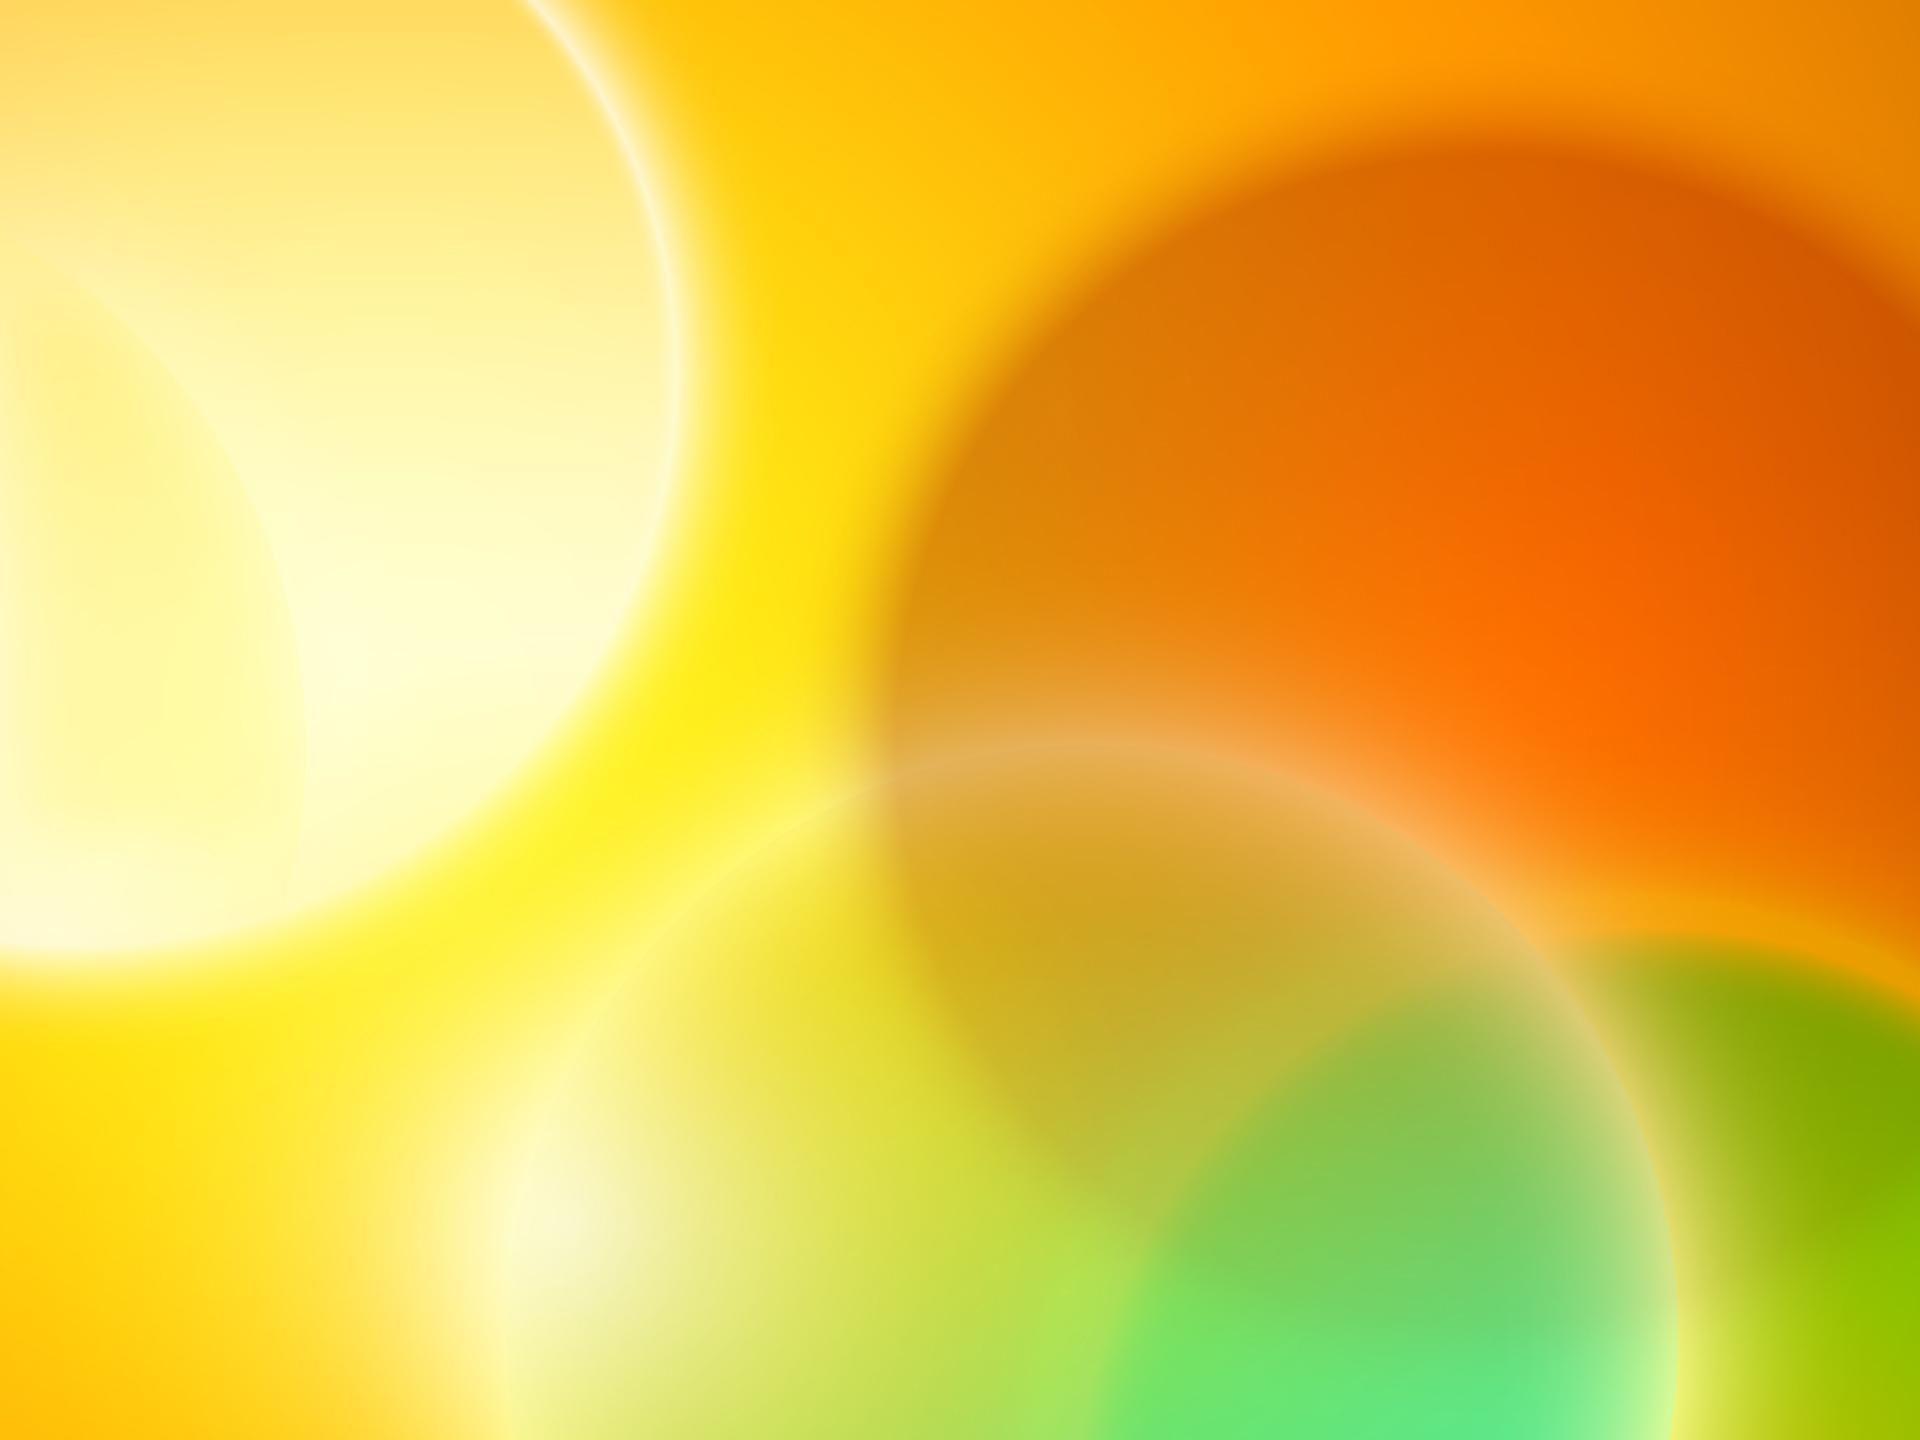 wallpaper Index of /wpcontent/gallery/windowsm3